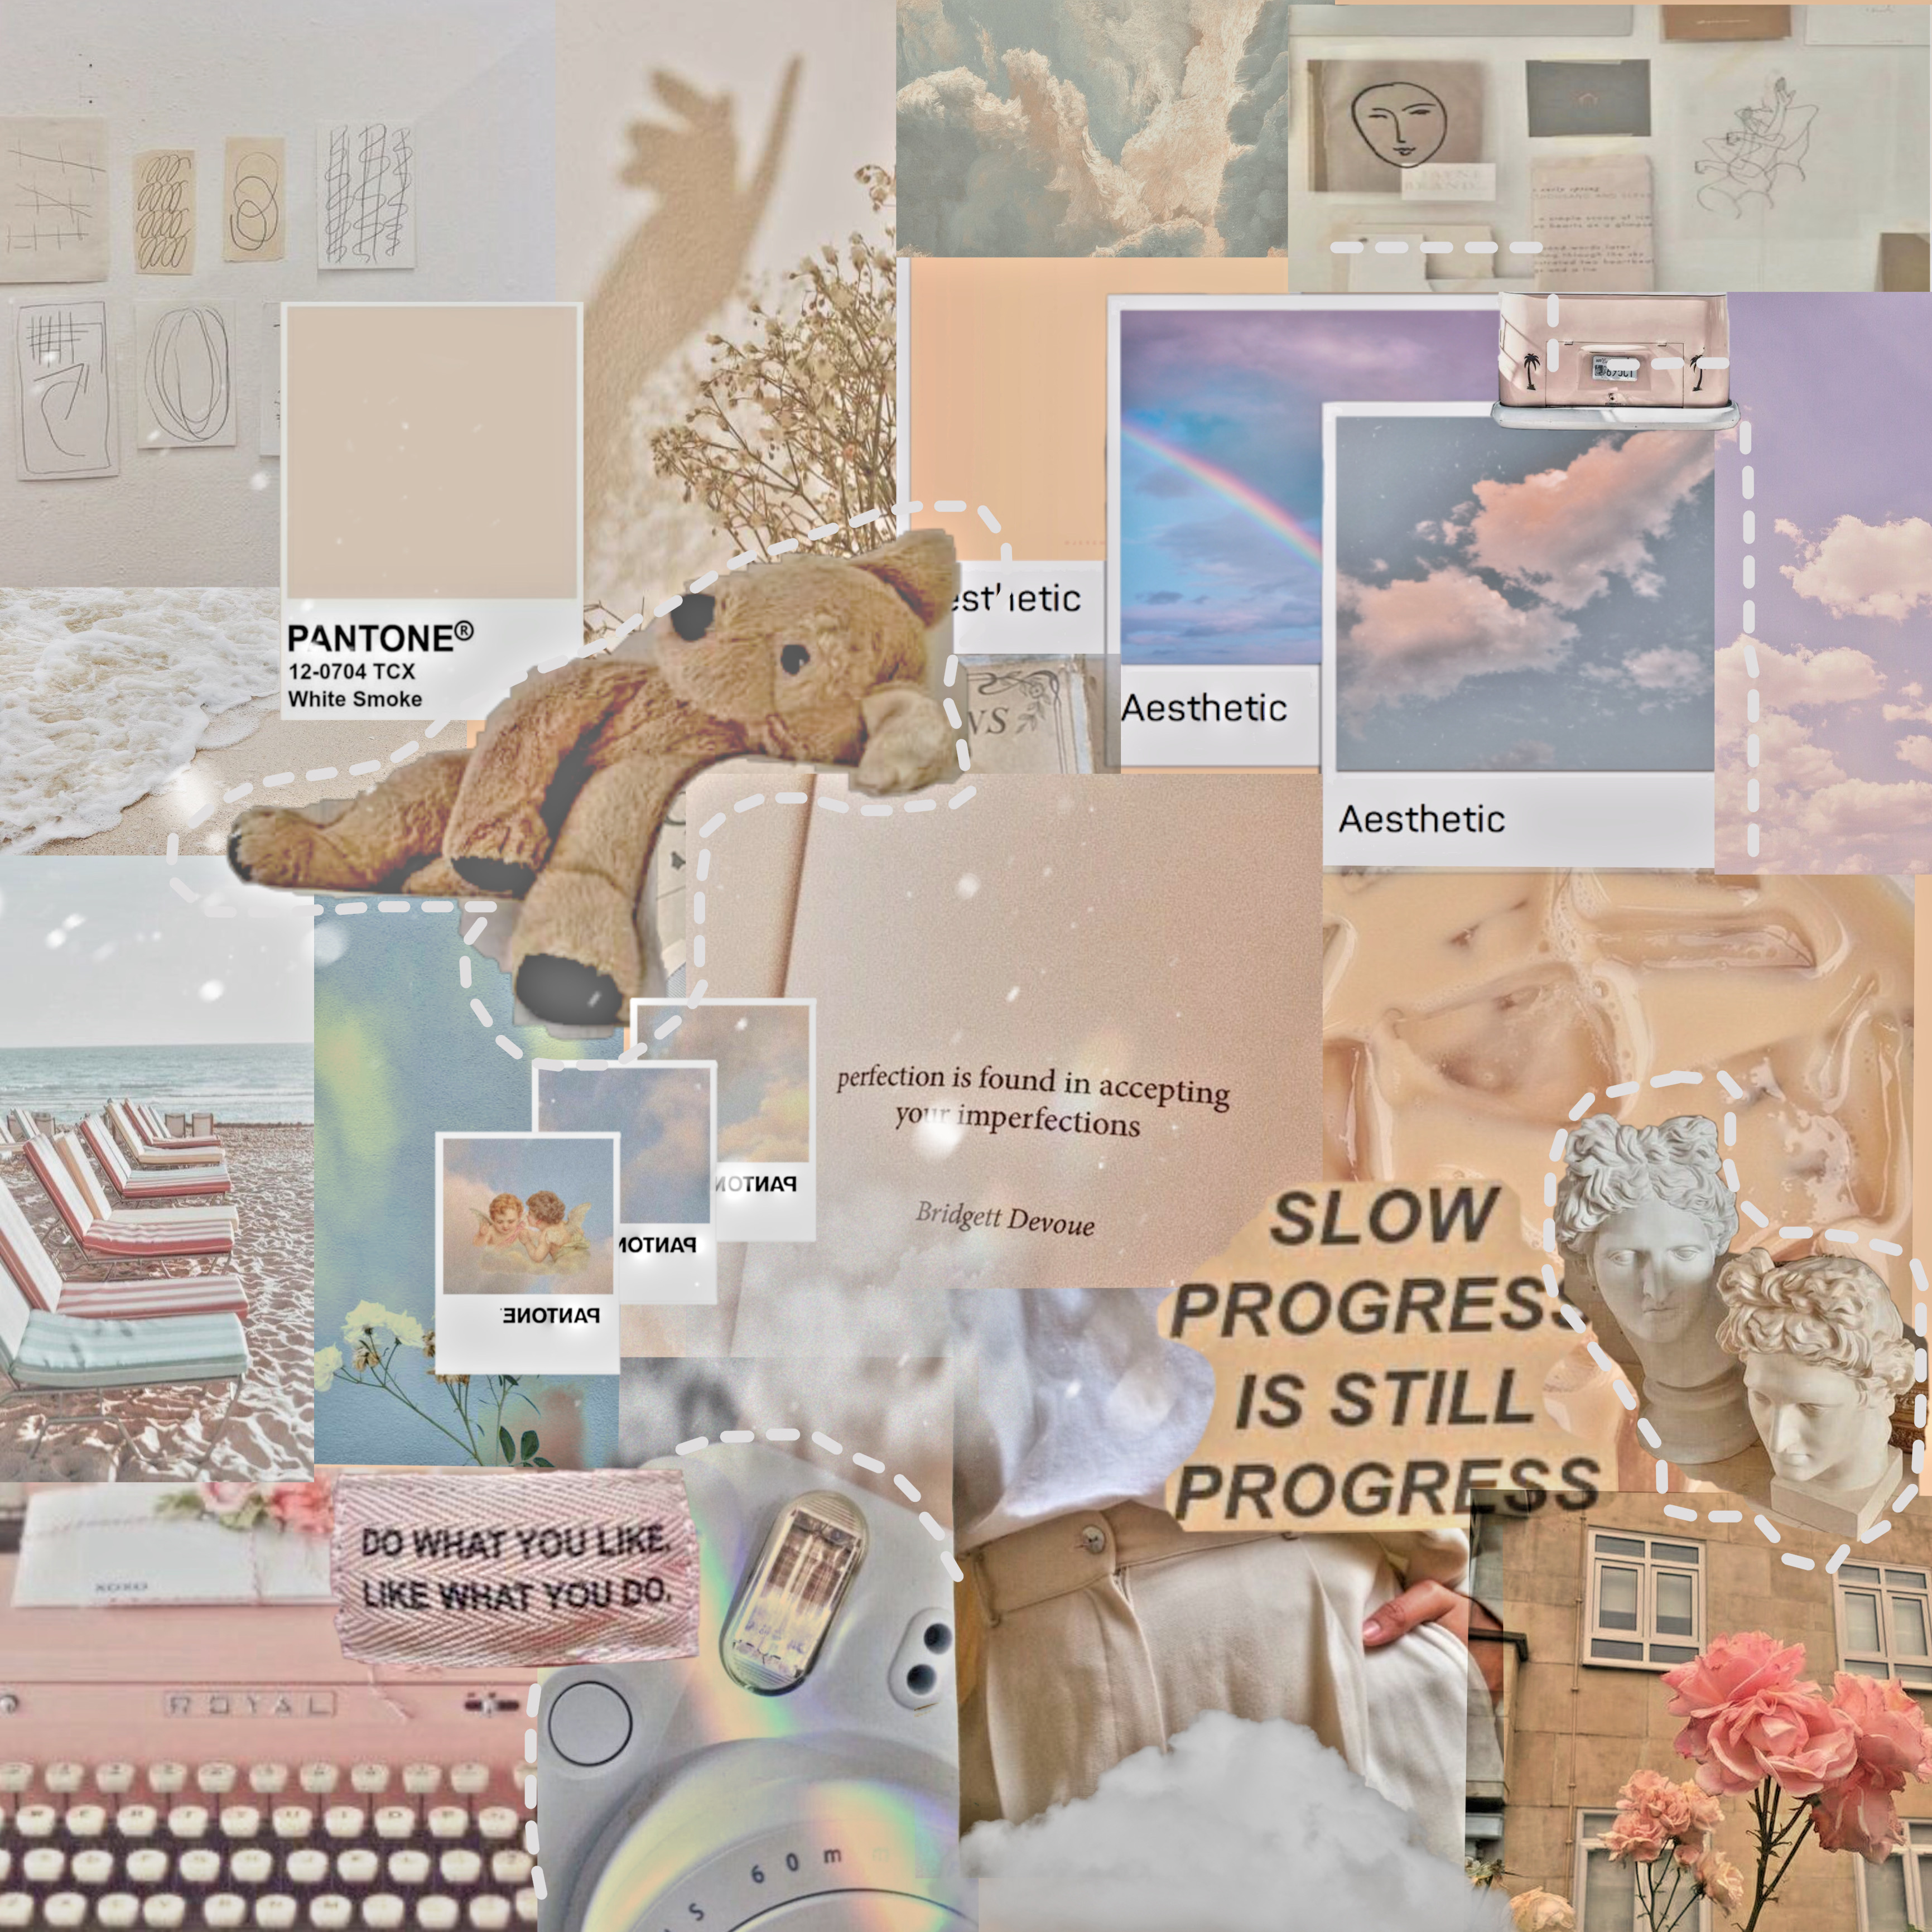 Aesthetic Cream Pastel Tumblr Image By Summerrrrrr